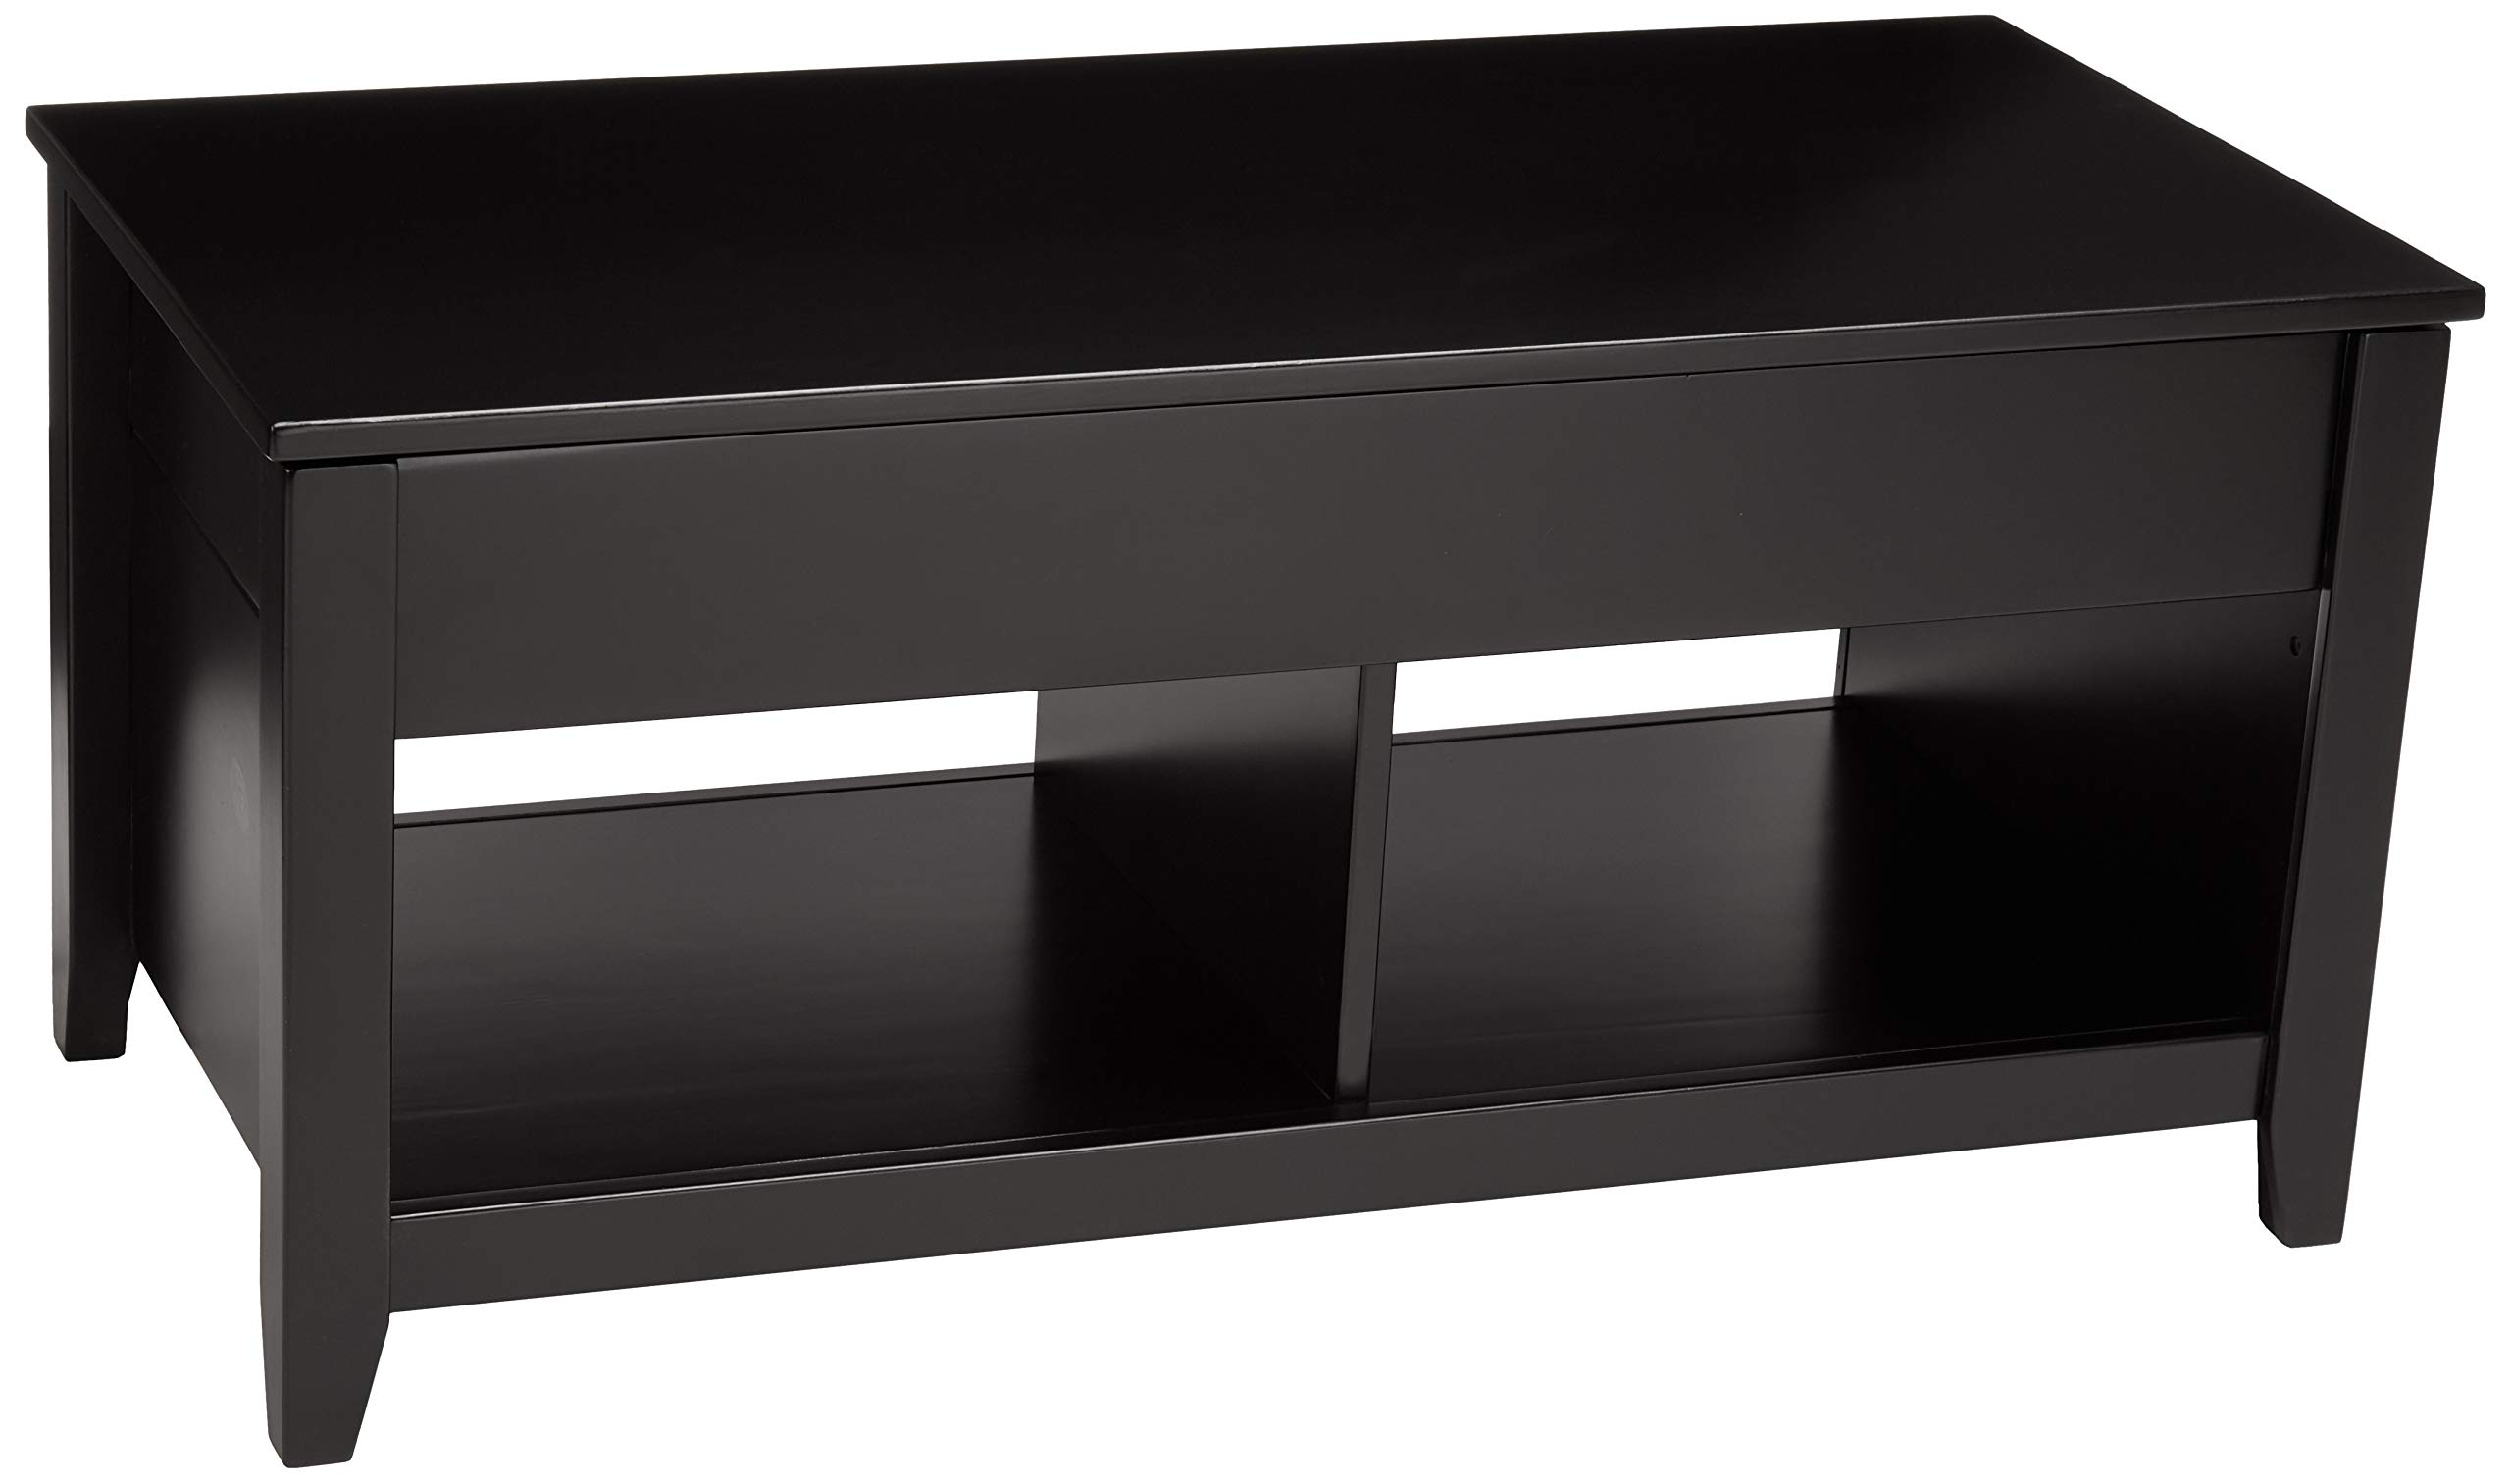 AmazonBasics Lift-Top Storage Coffee Table, Black by AmazonBasics